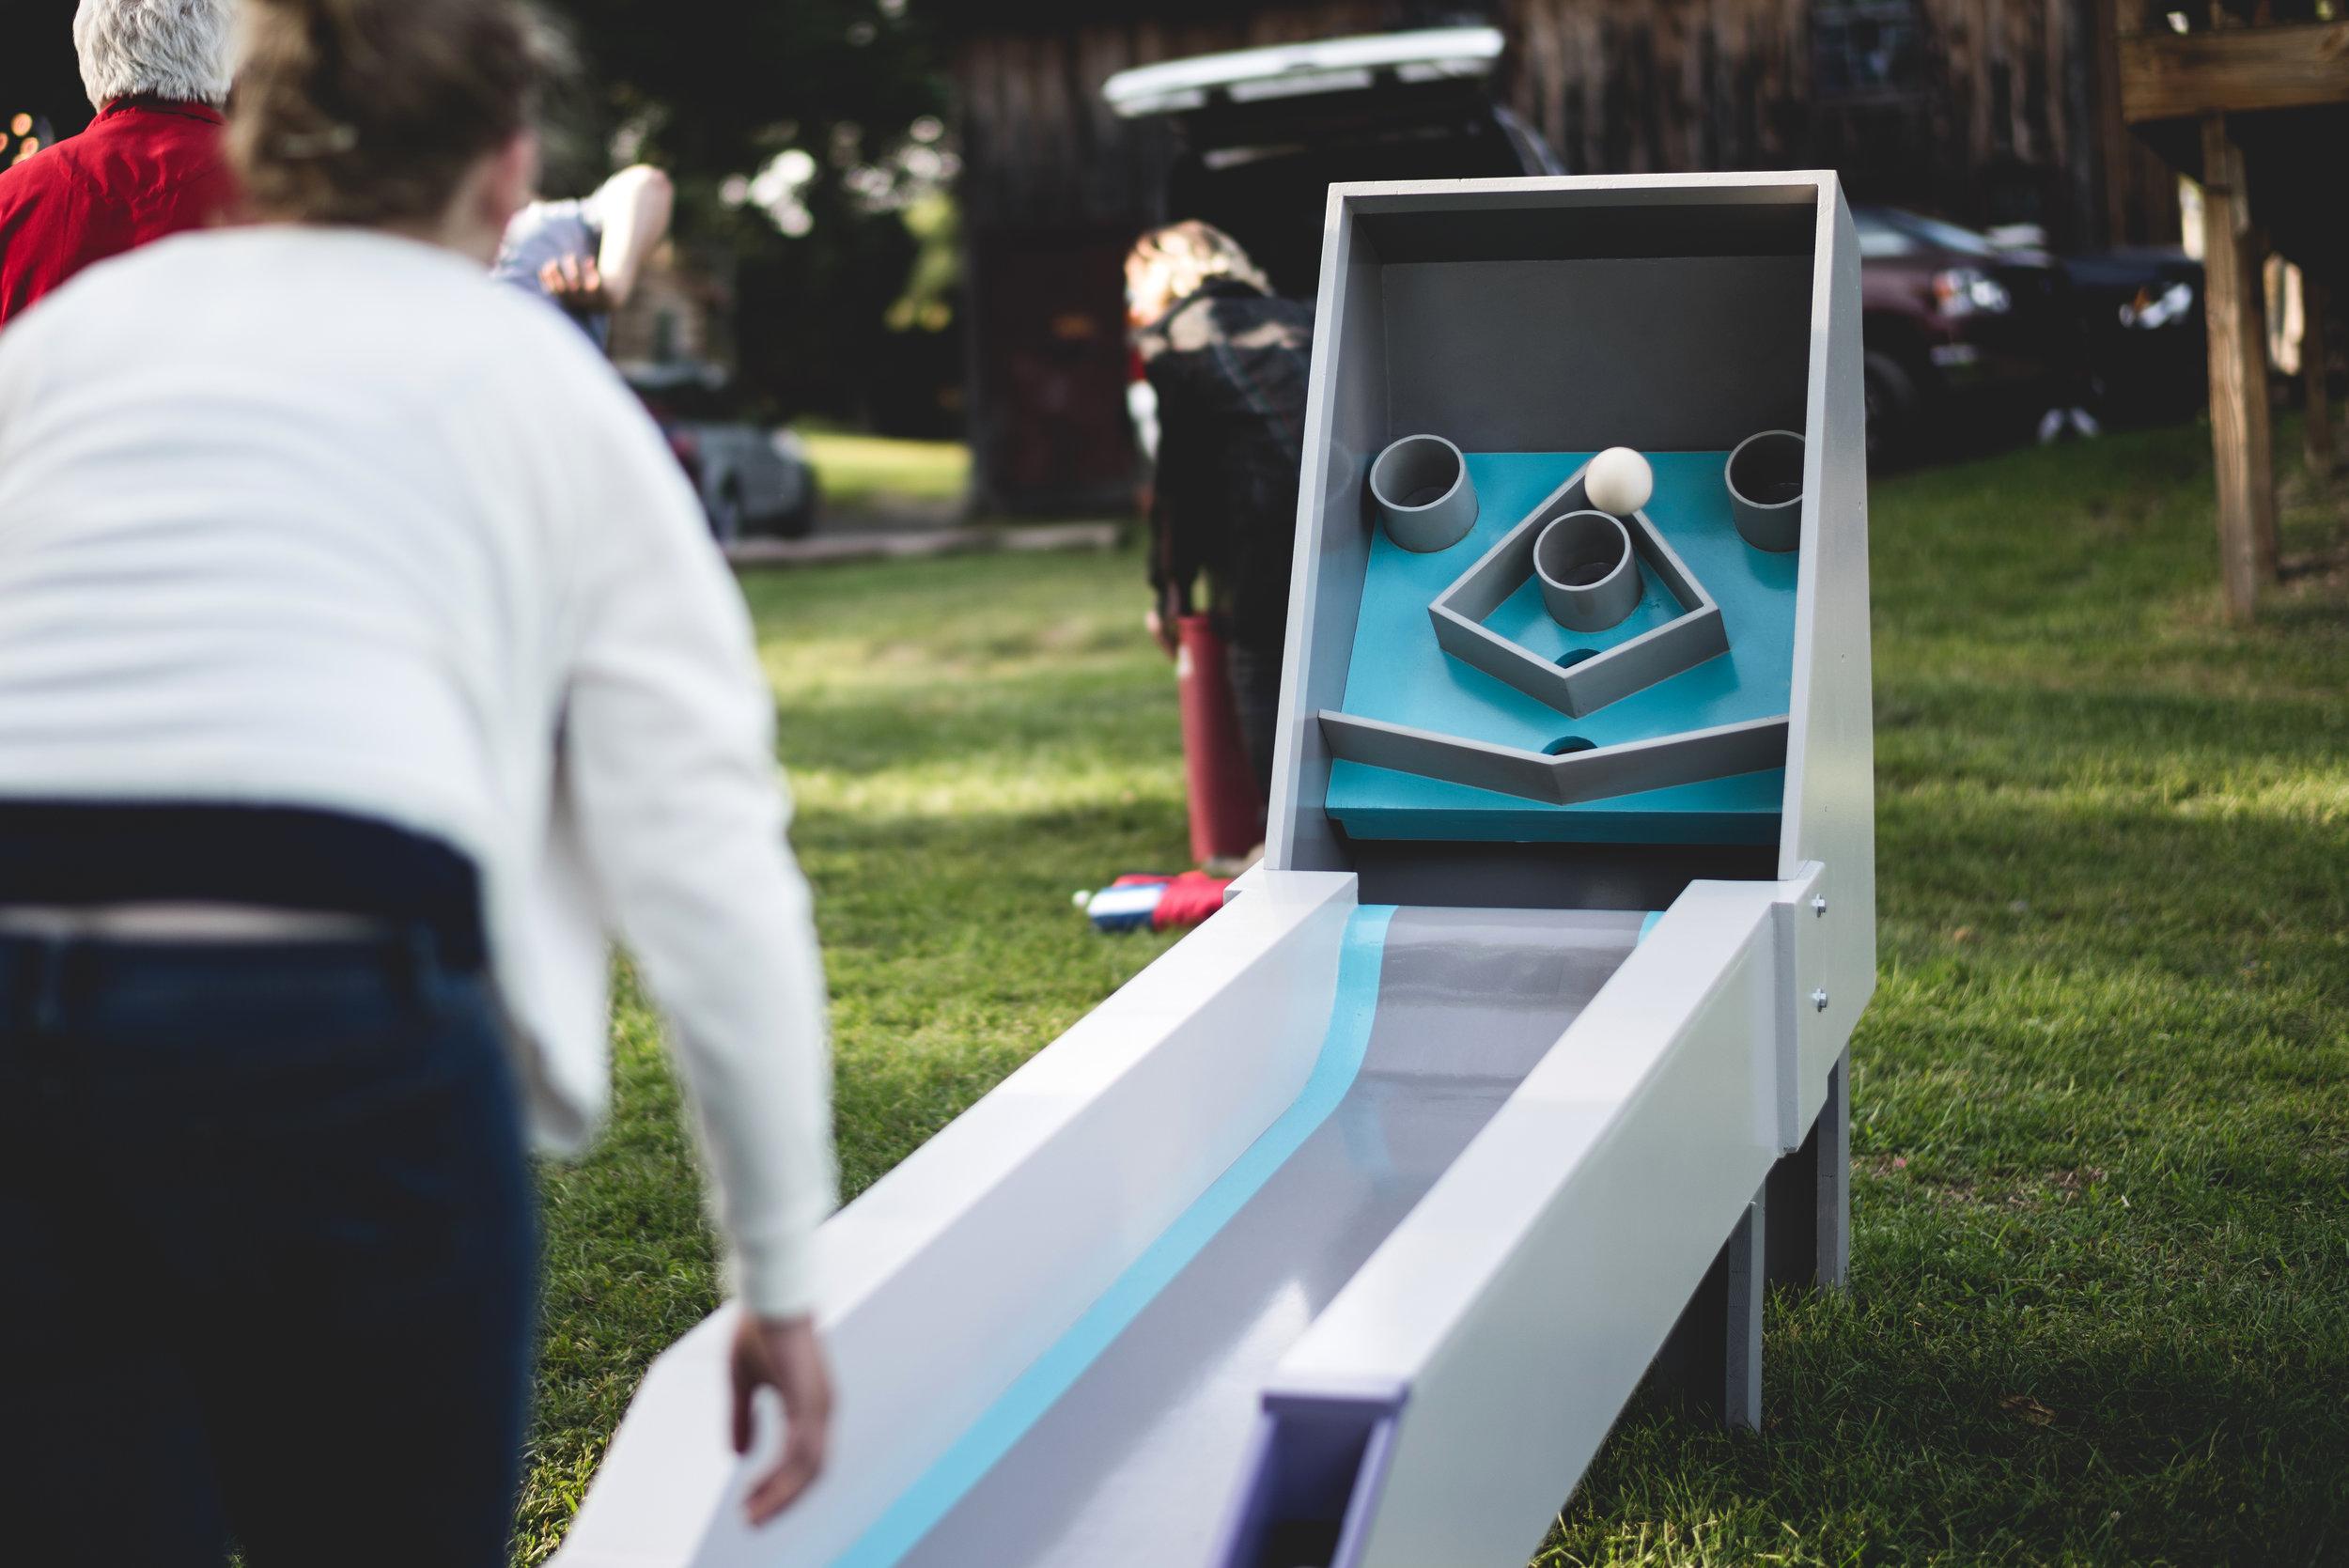 Burkson Skee Ball Machine